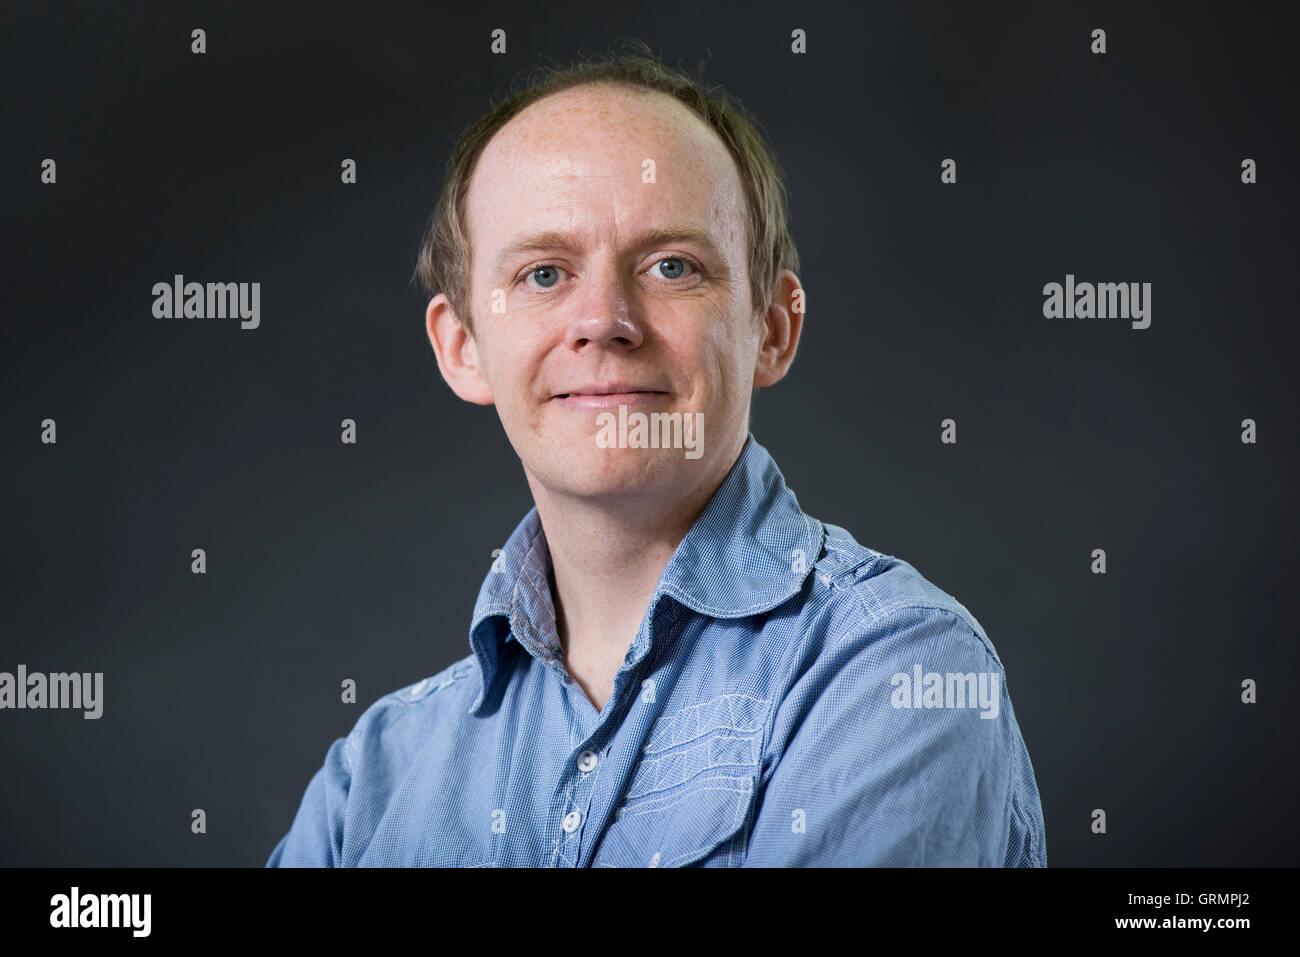 Scots Language specialist Thomas Clark. - Stock Image